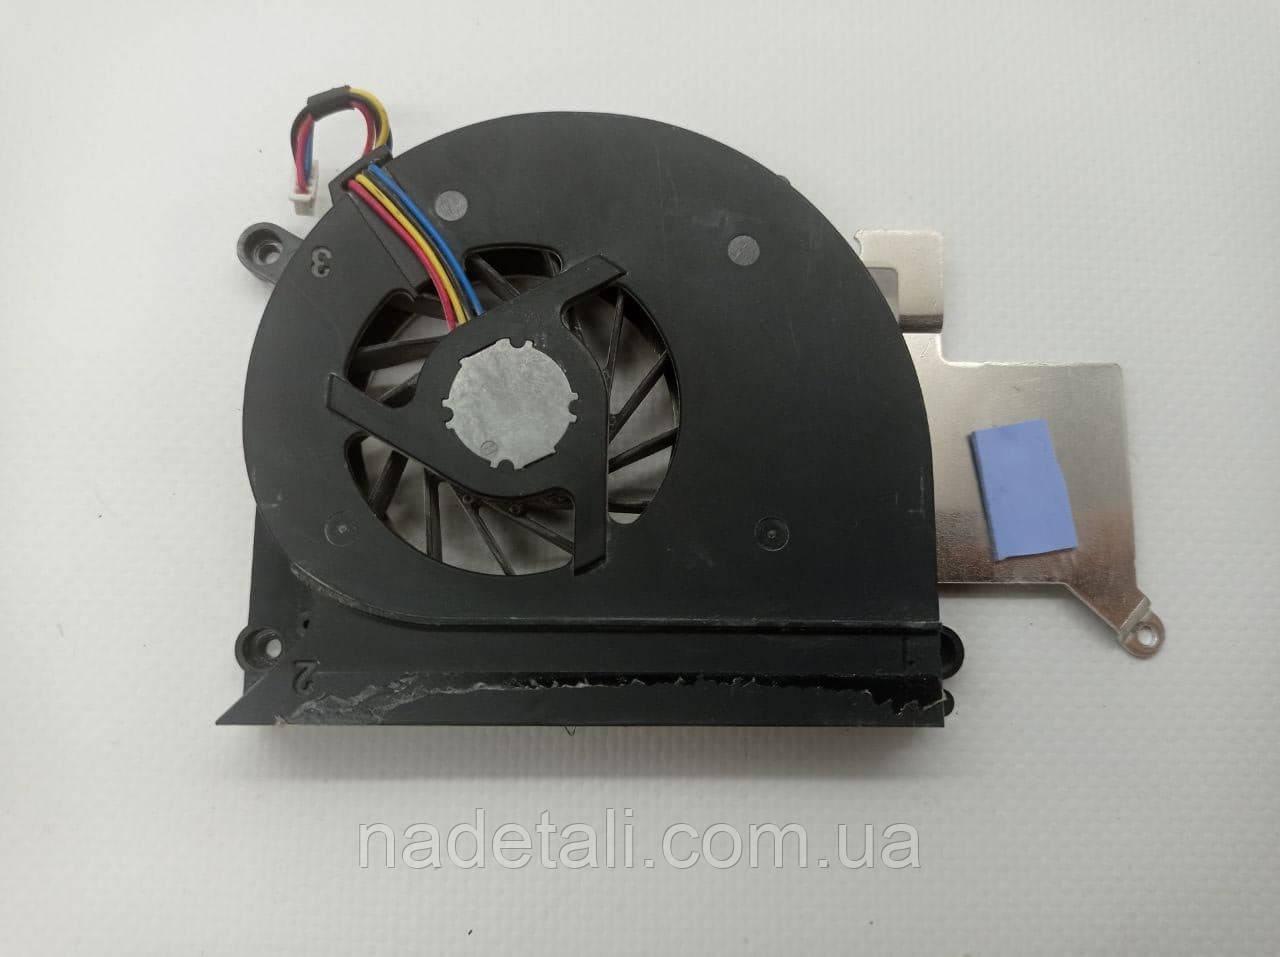 Вентилятор Panasonic UDQFZZH32DAS 4pin